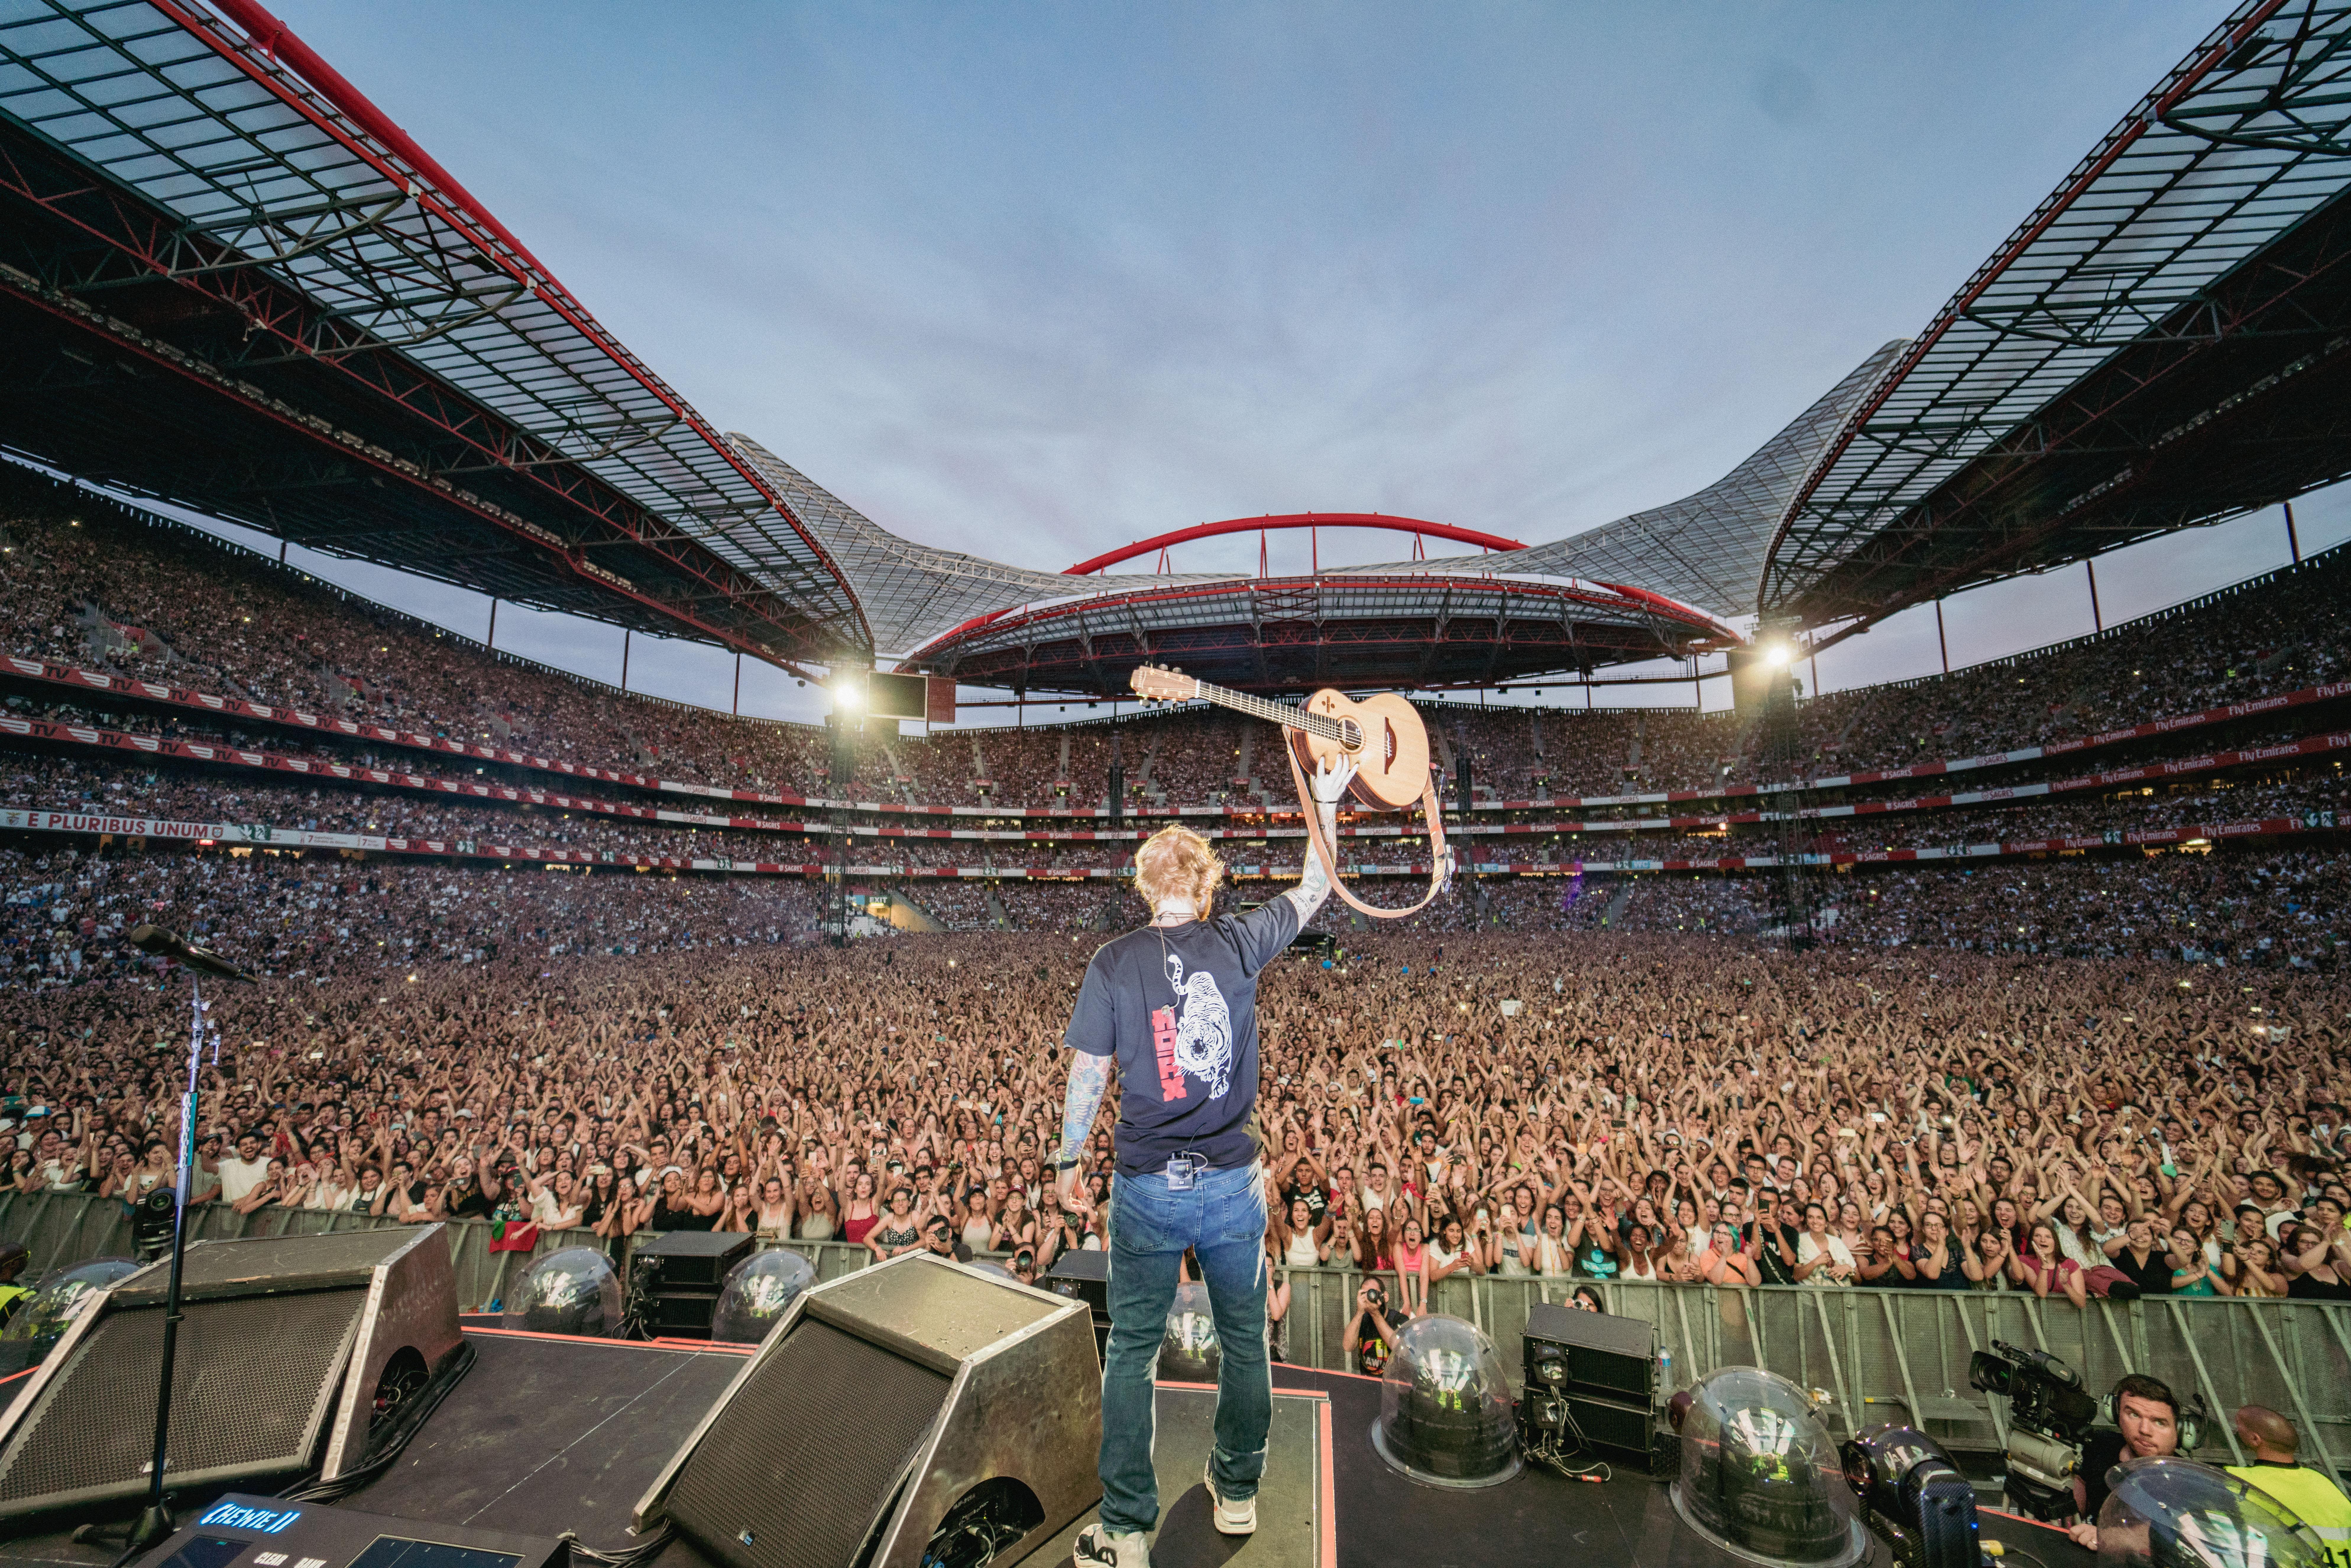 Ed Sheeran + – = ÷ x Tour